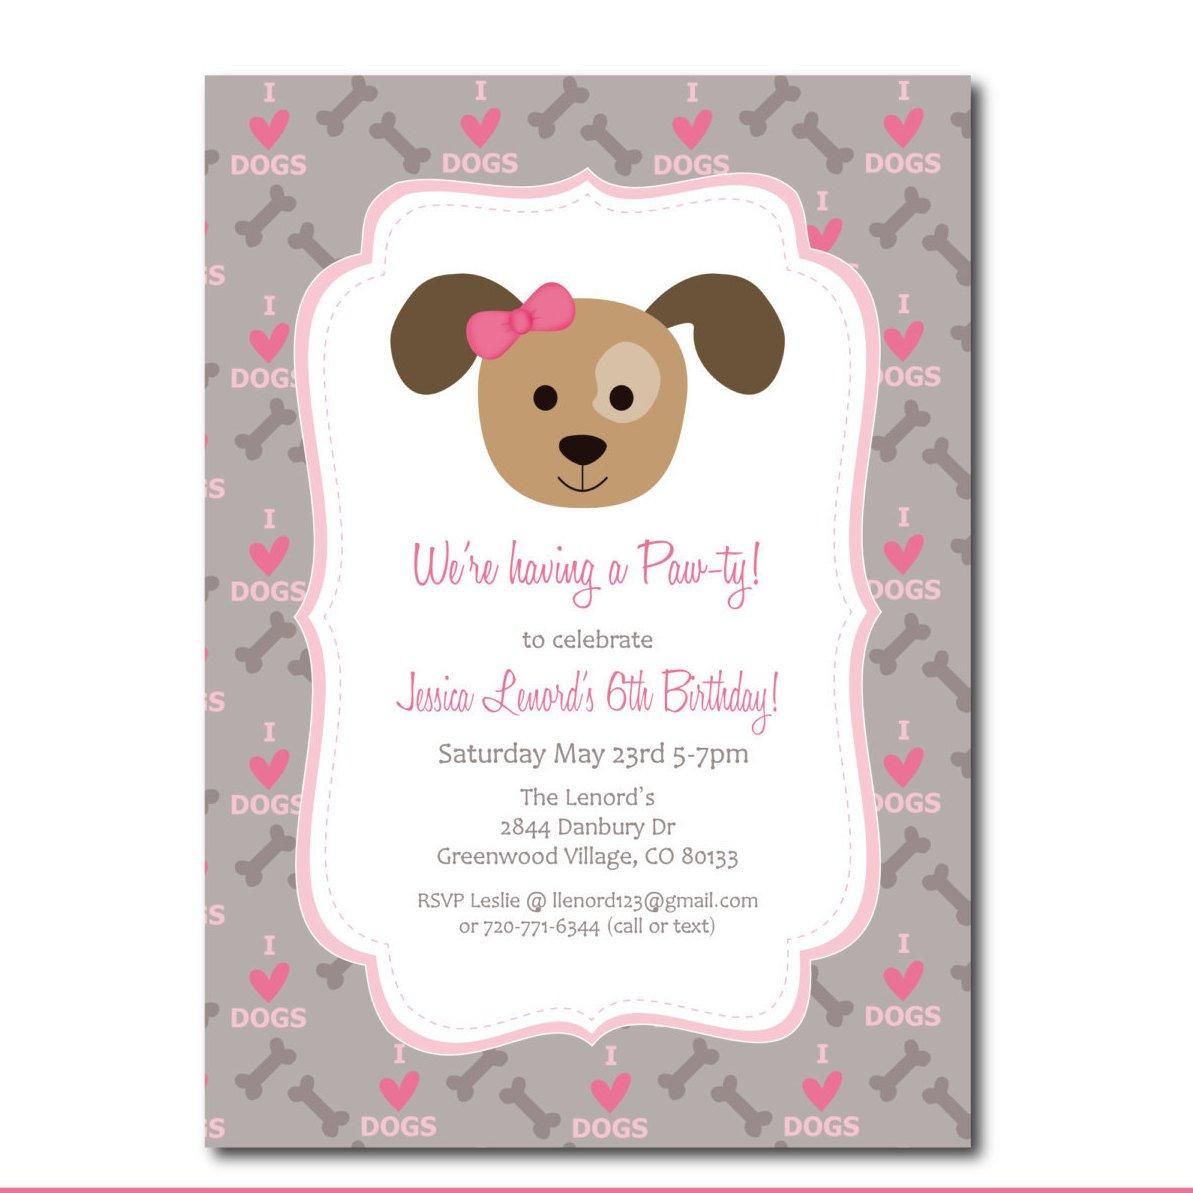 Puppy Shower Invitations Free Free Printable Puppy Shower Invitations - Free Printable Puppy Dog Birthday Invitations